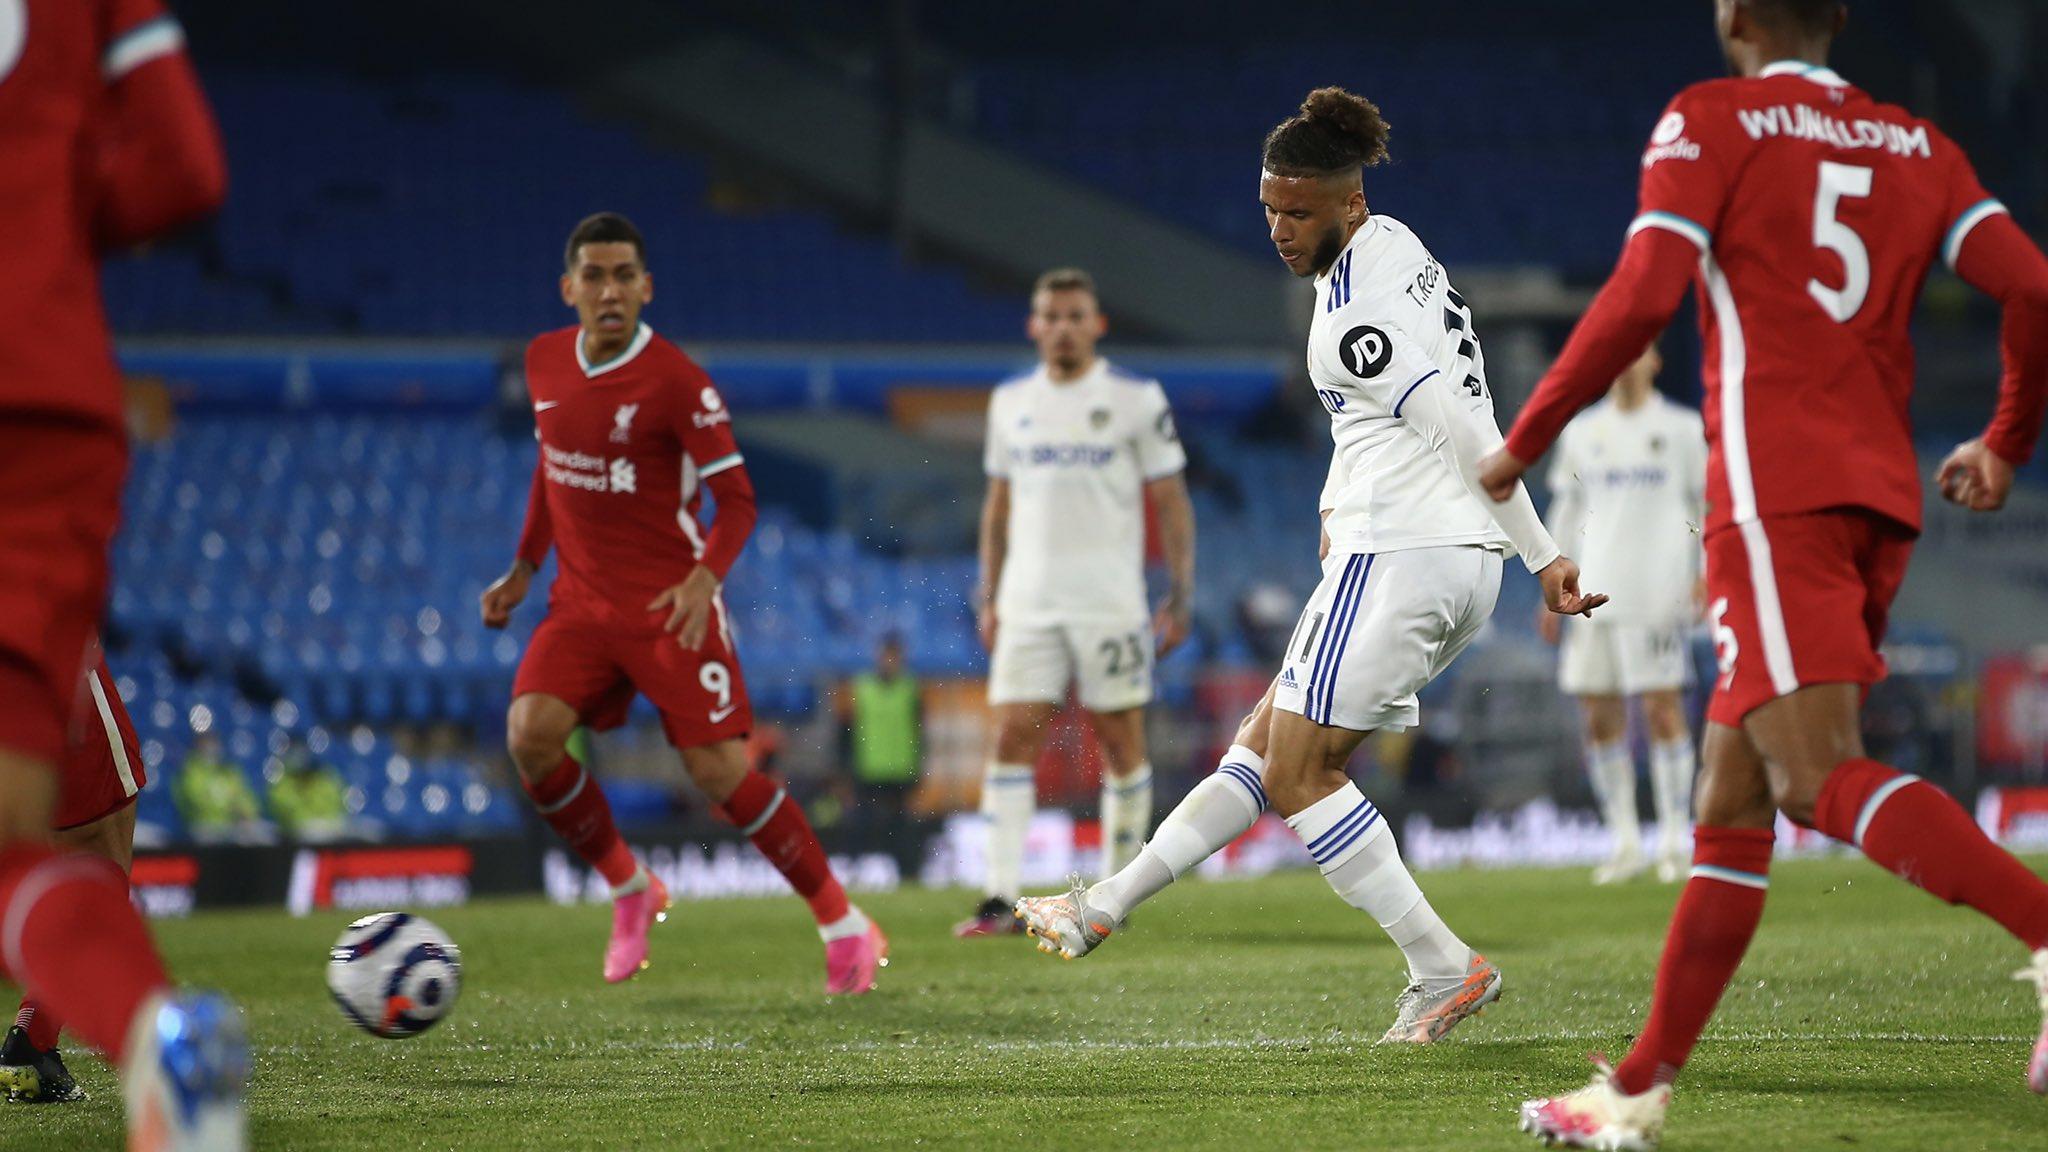 Superliga europea: Liverpool empató con el Leeds   RCN Radio